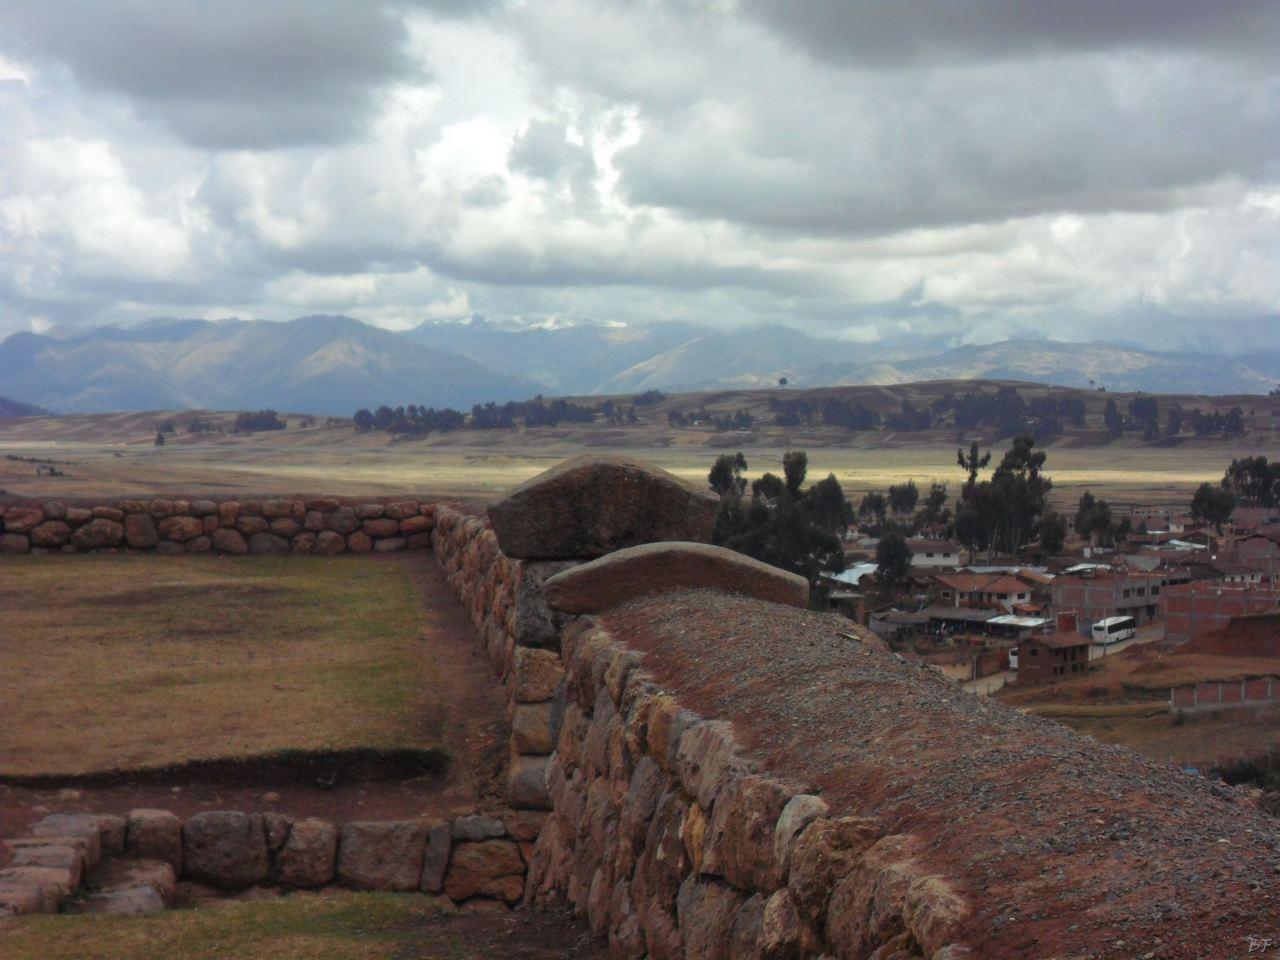 Chinchero-Mura-Poligonali-Piramide-Urubamba-Peru-24